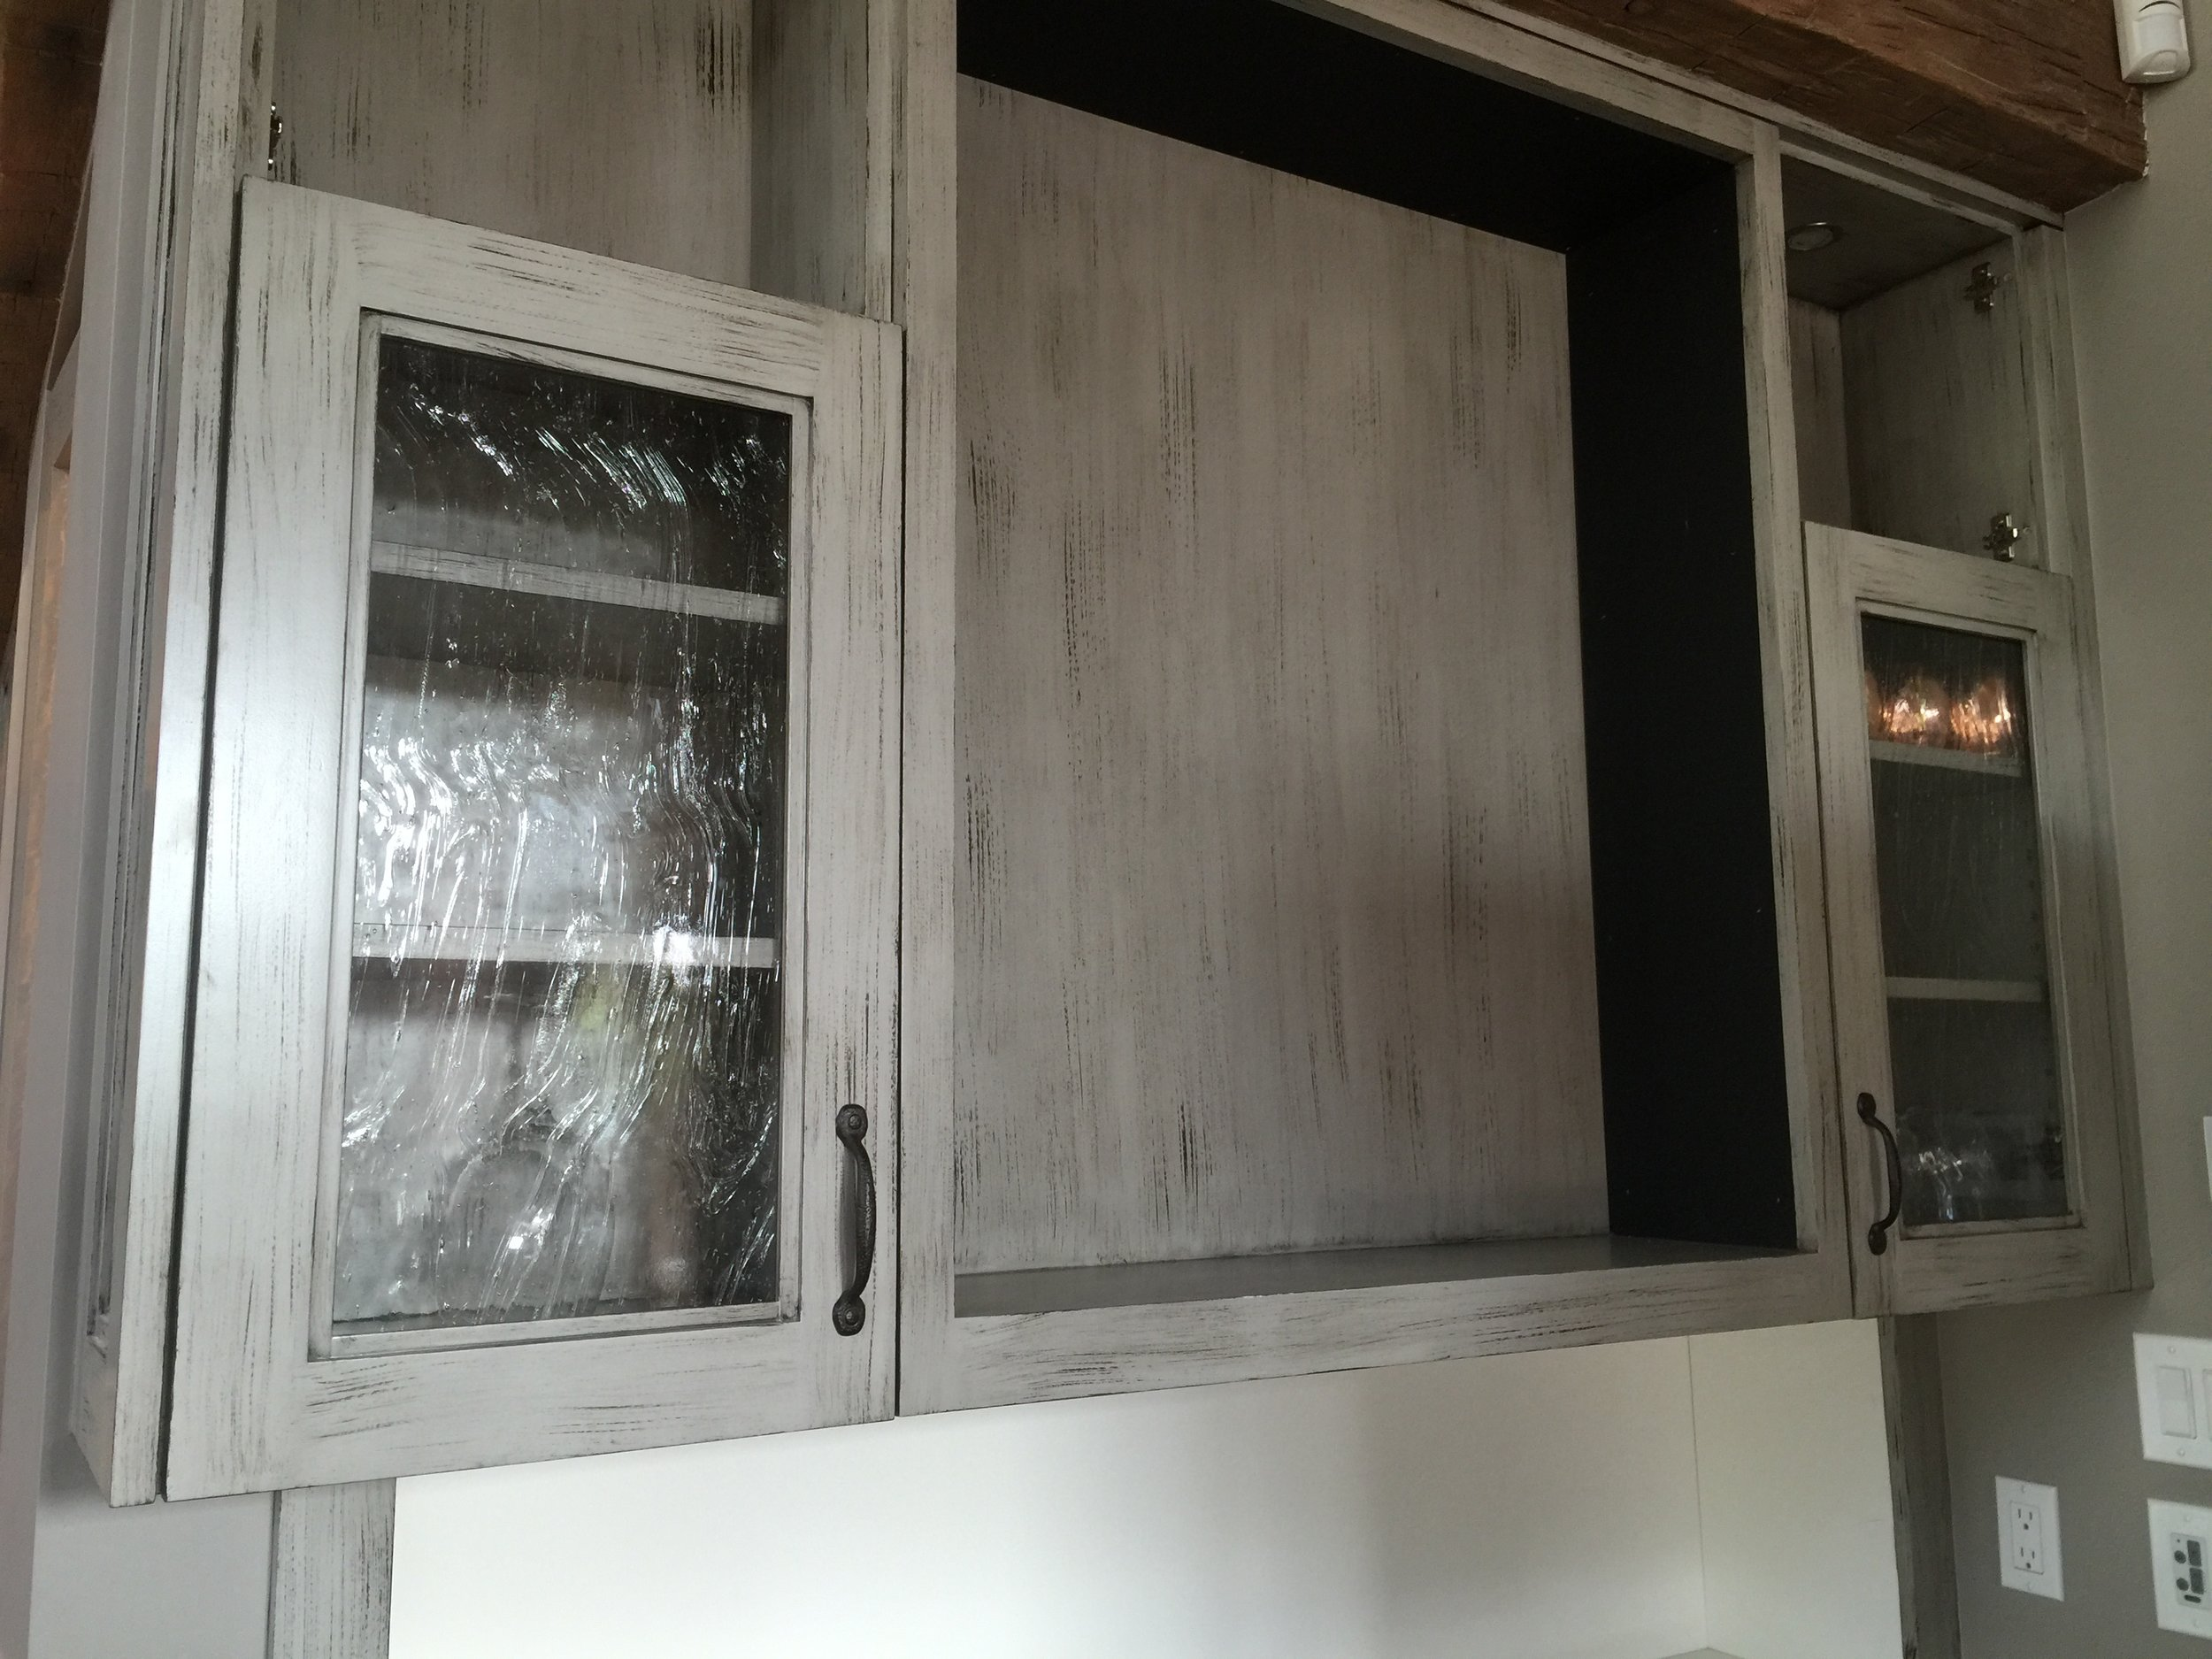 Cabinet doors with Seedy Swirl